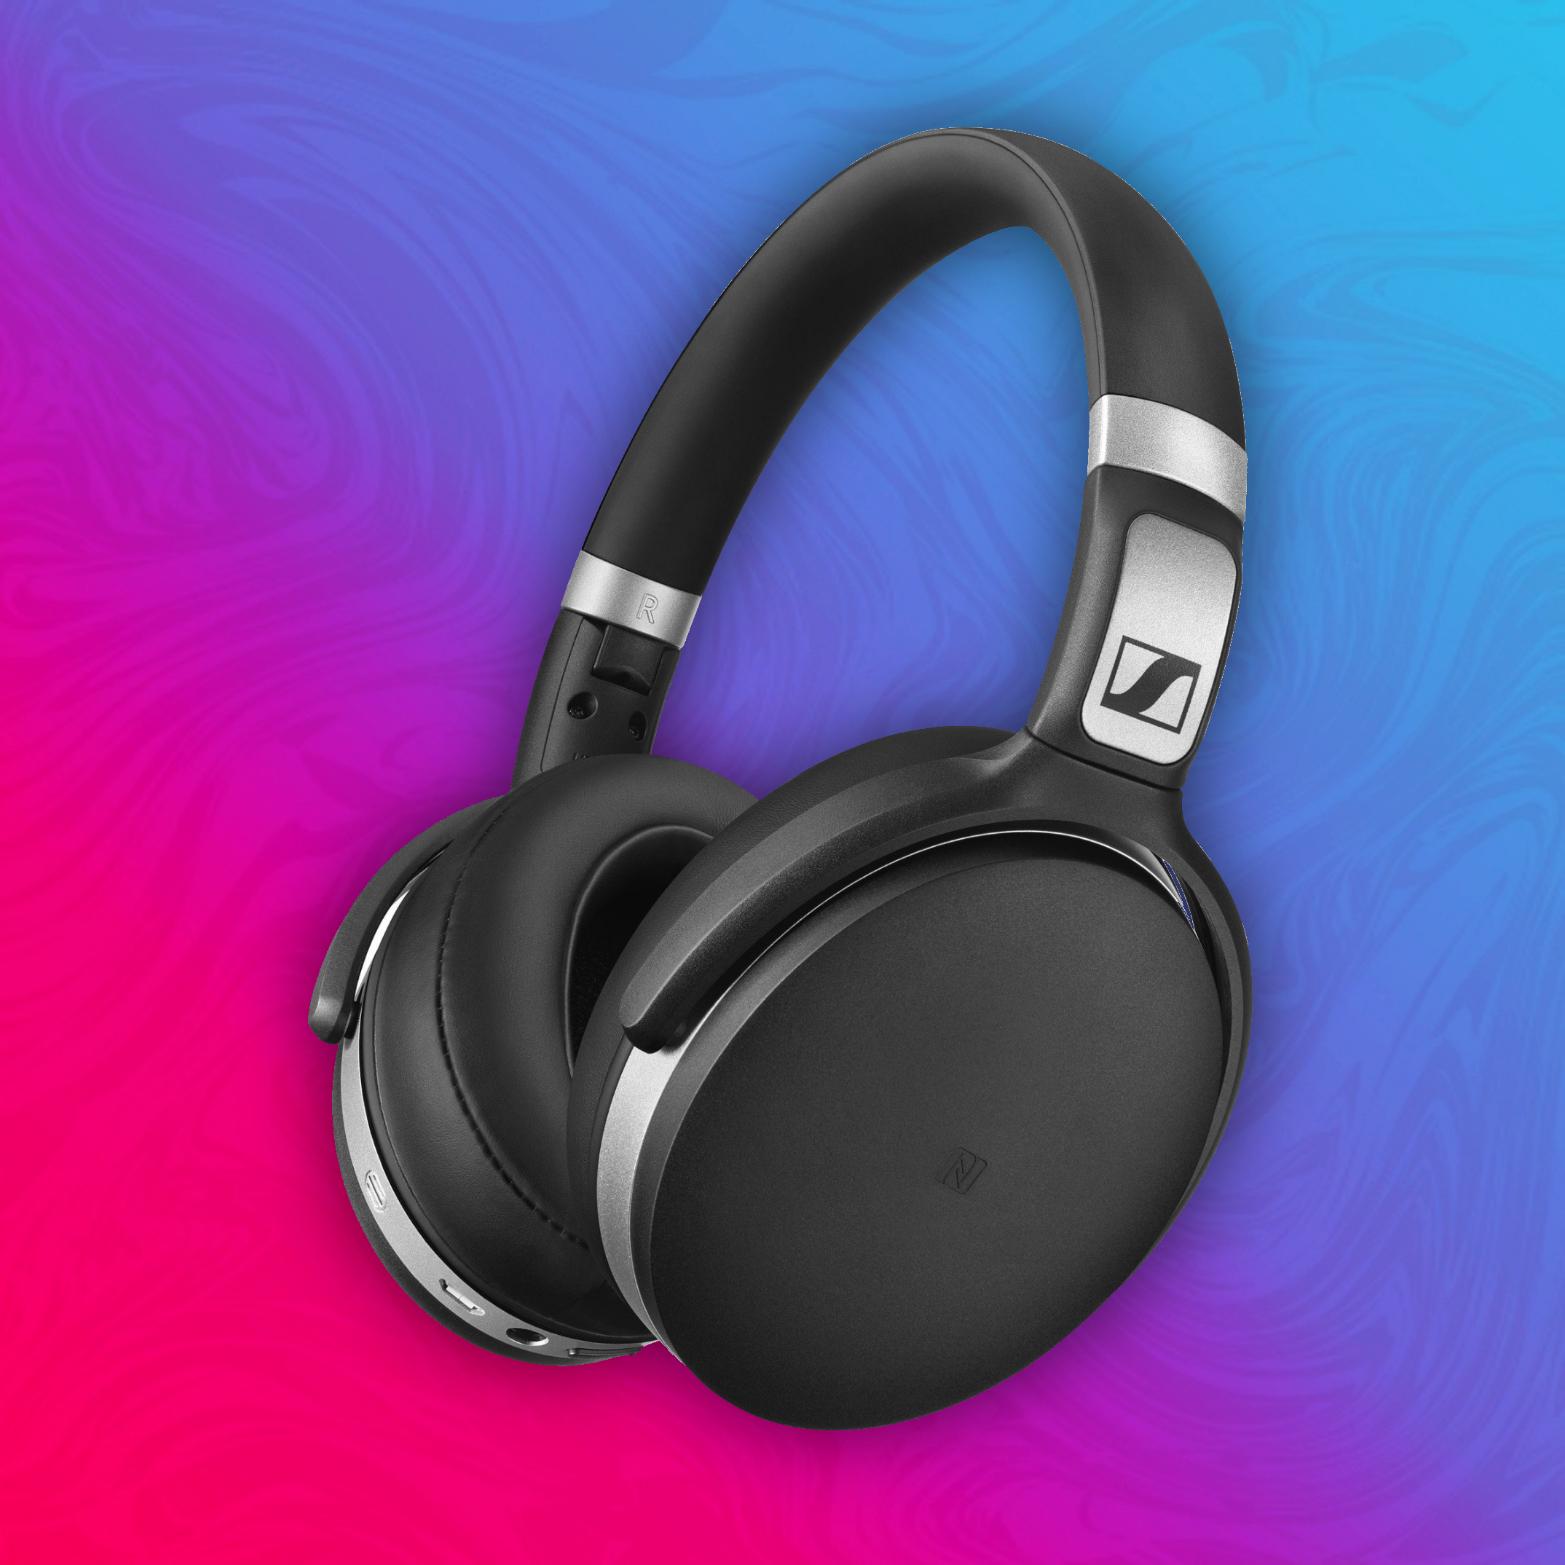 [Prime] Sennheiser HD 4.50 BTNC Kopfhörer (mit Bluetooth, kabelloses geschlossenes Noise-Cancelling)